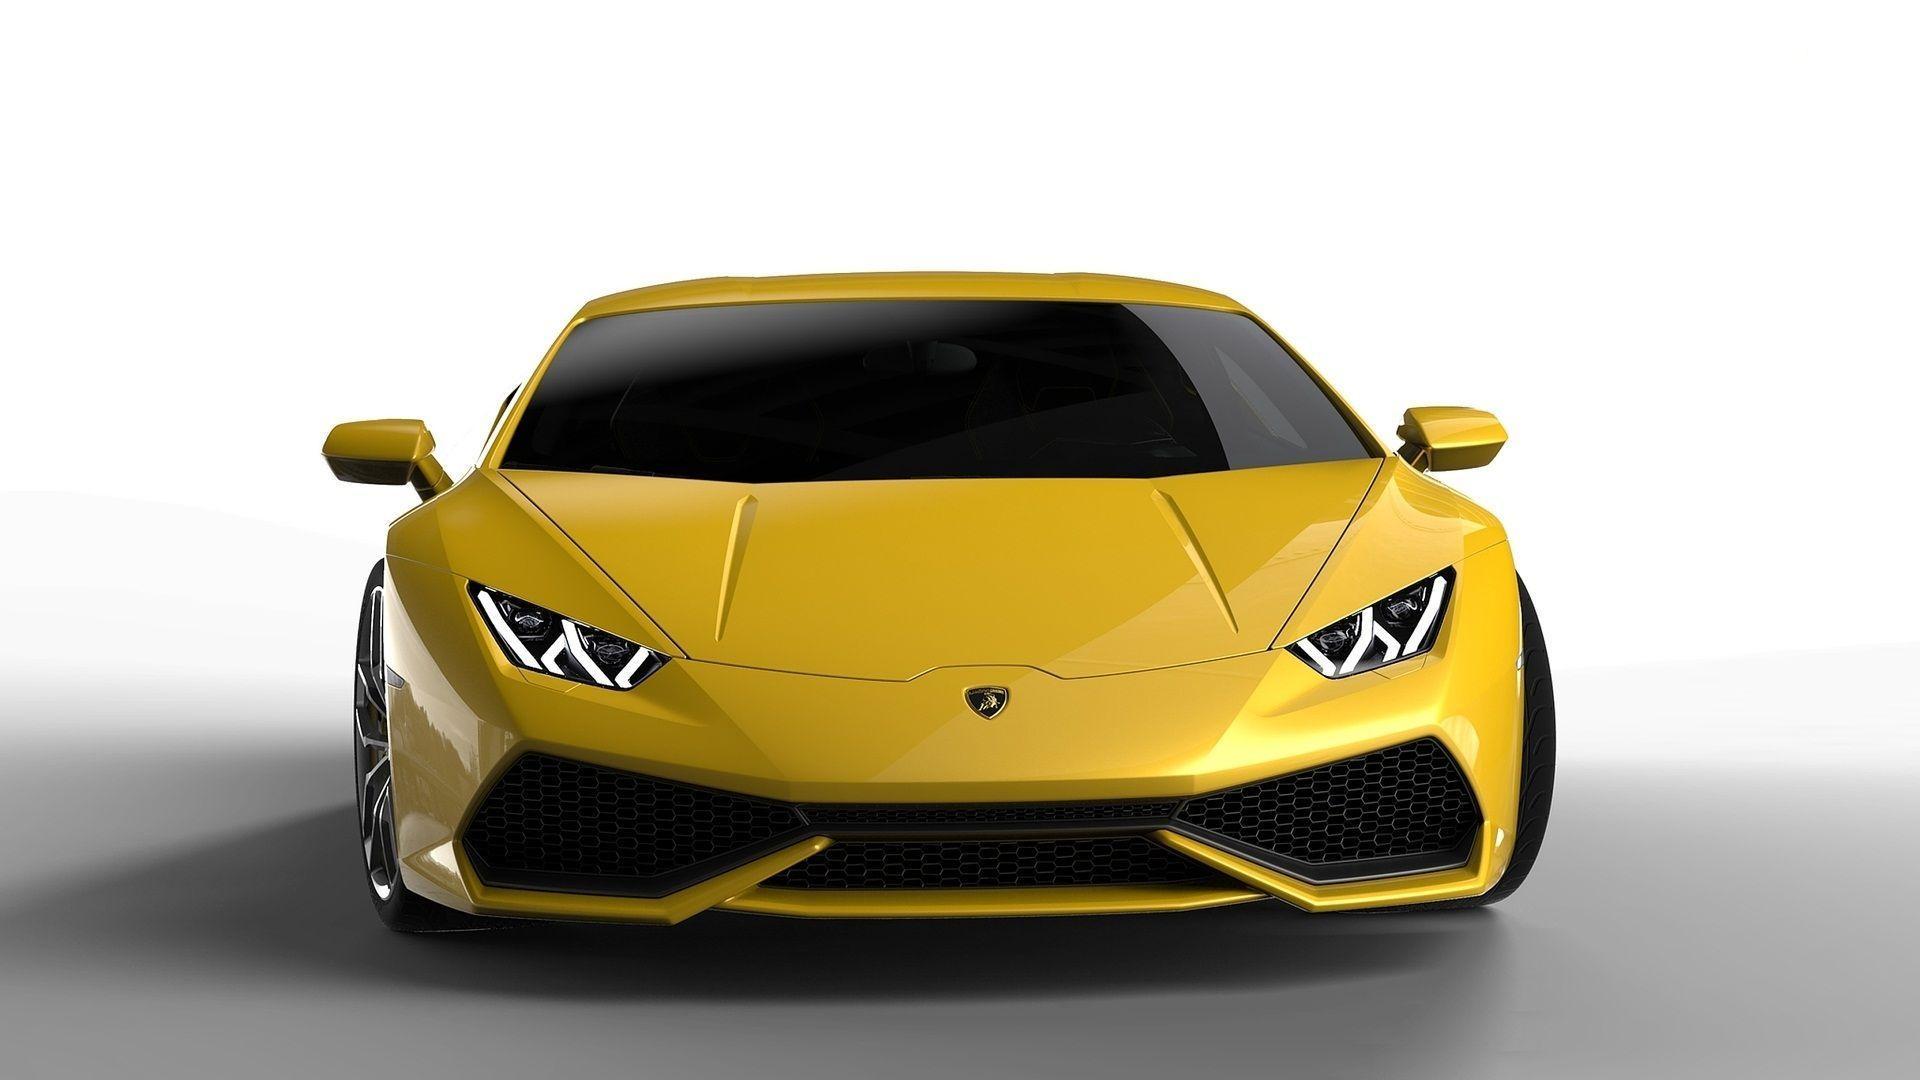 lamborghini huracan hd wallpapers 1080p widescreen wallpapers - Lamborghini Huracan Hd Wallpapers 1080p